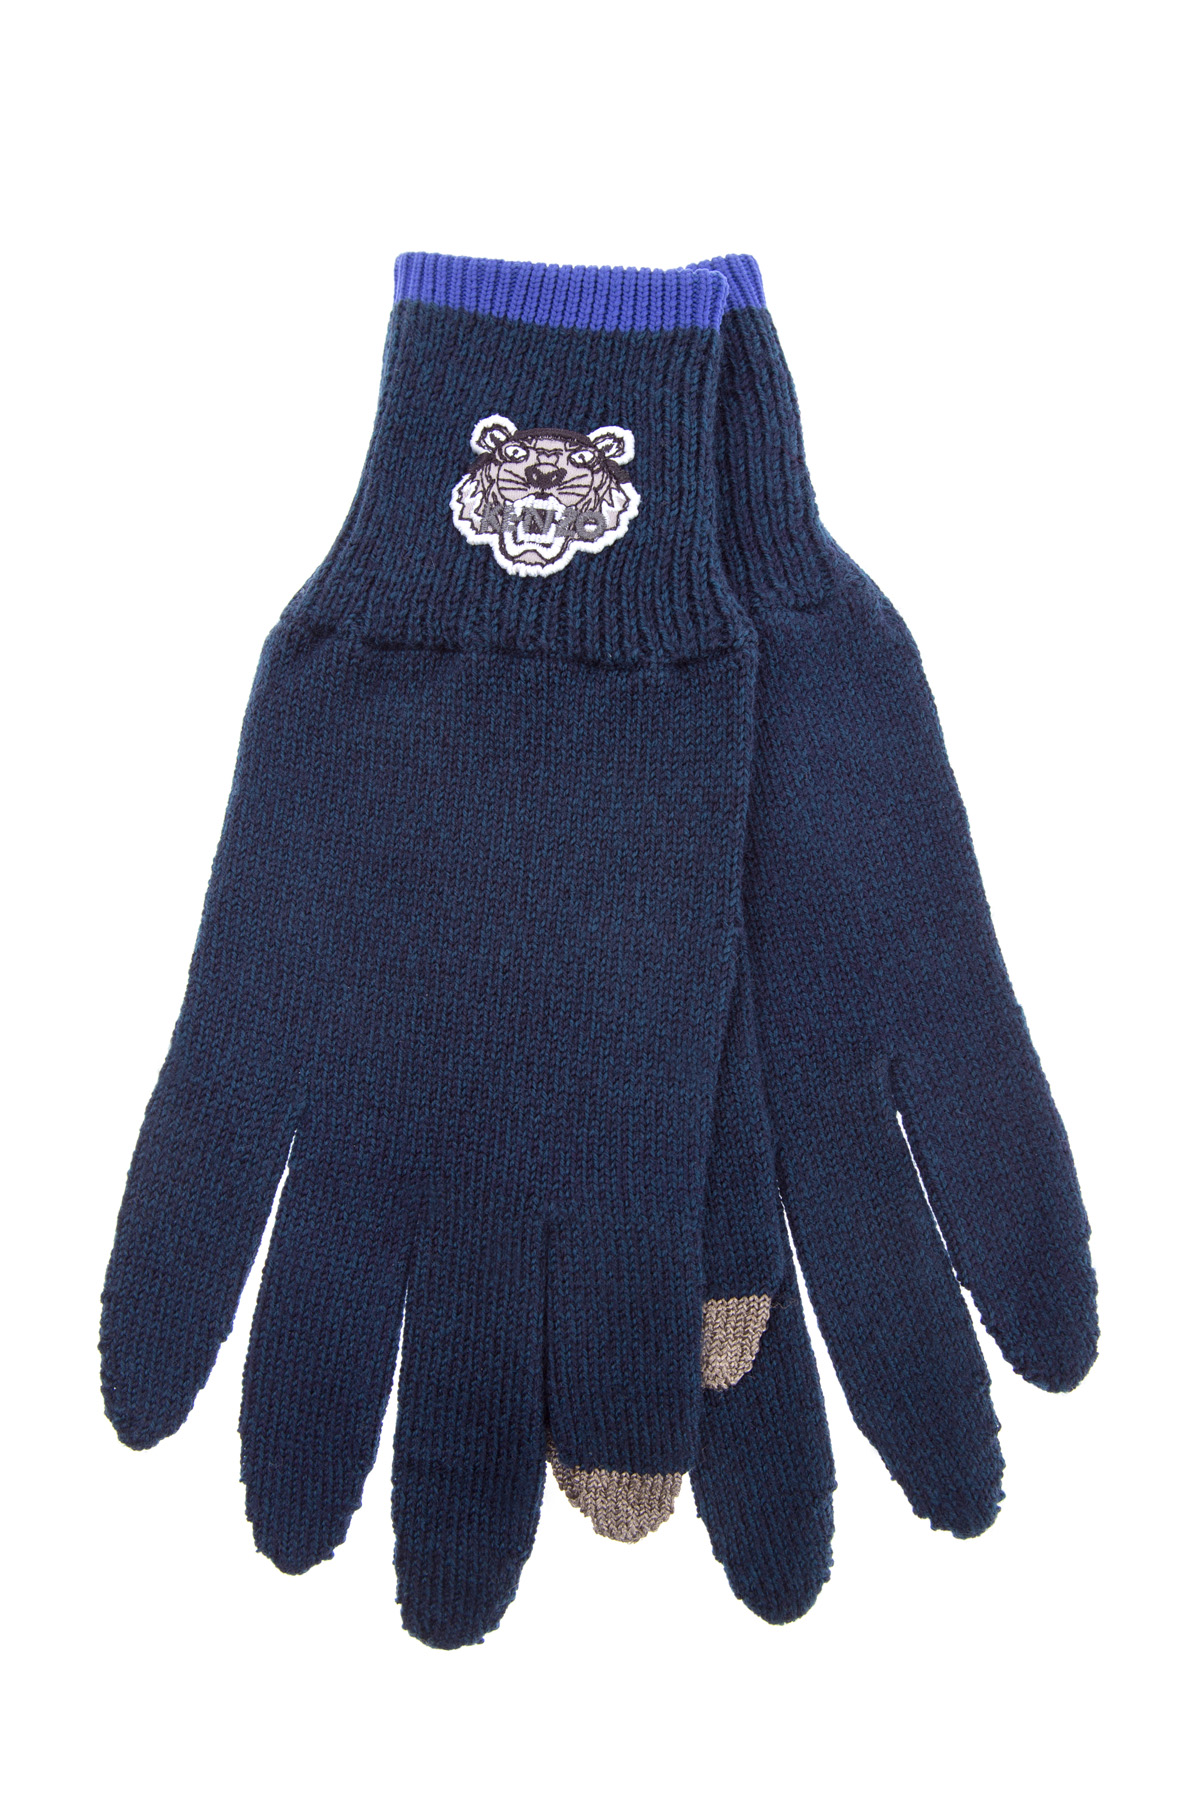 мужские перчатки kenzo